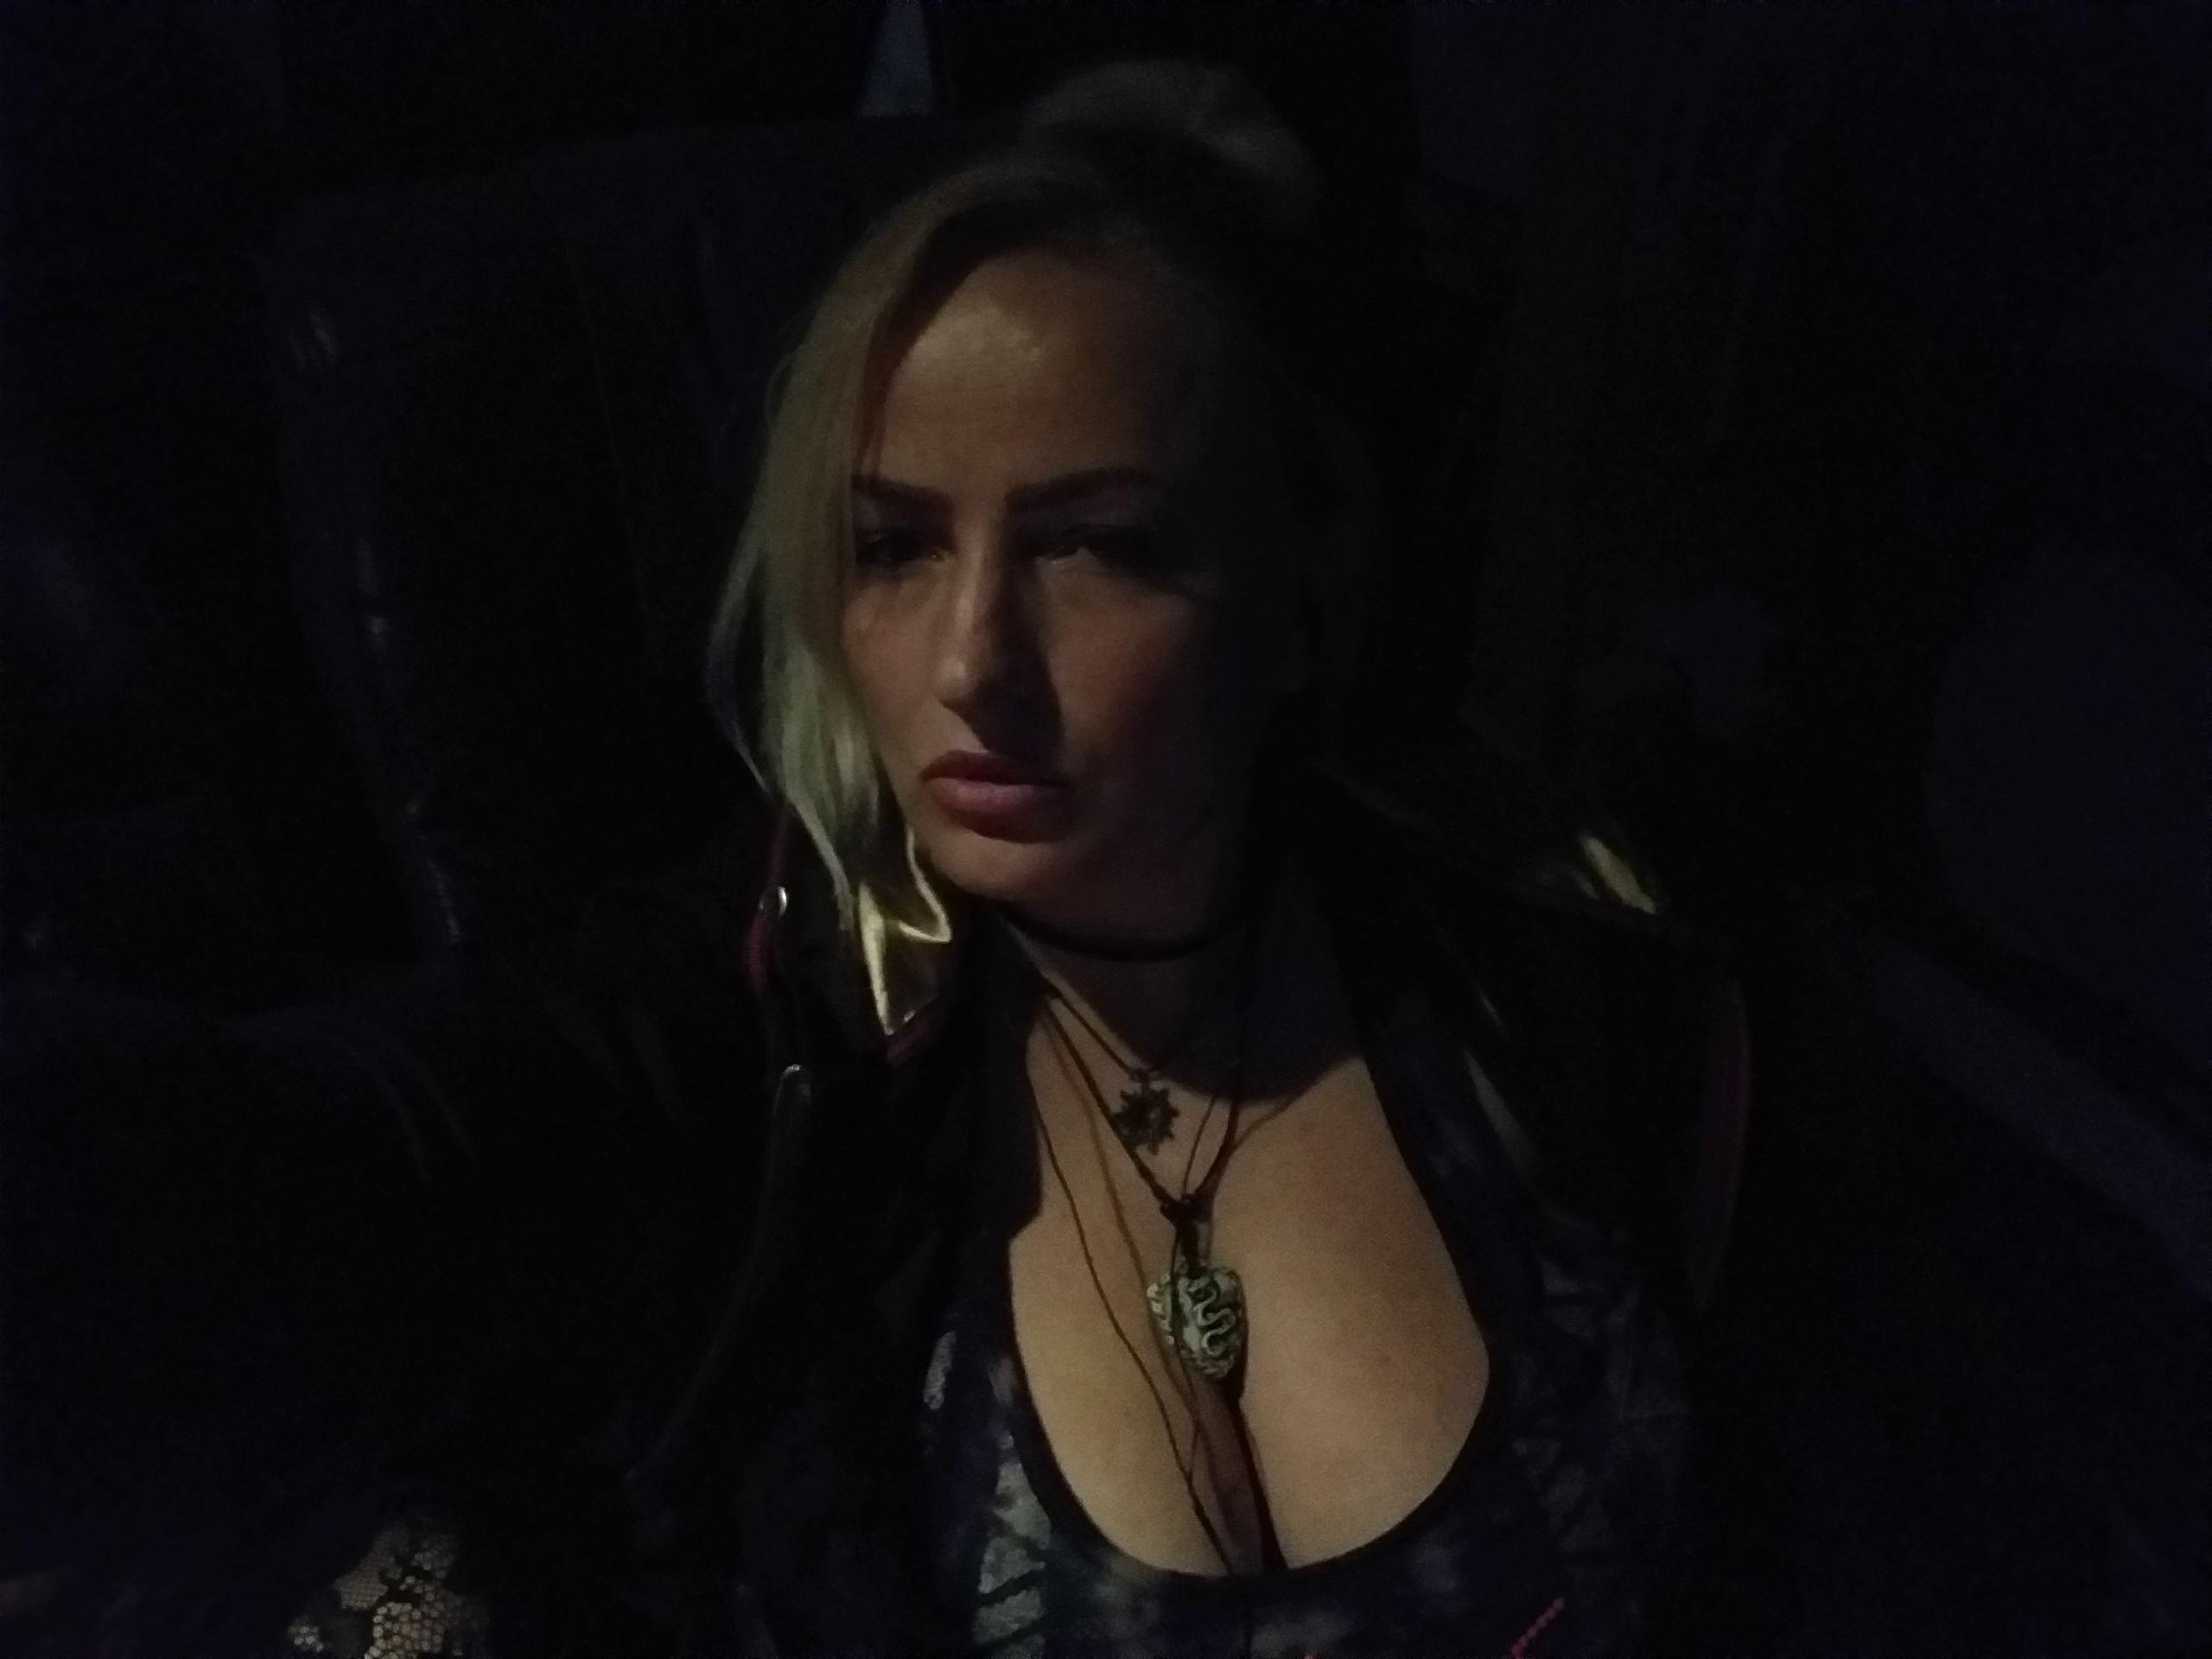 Елена Руденко (Валтея). Мои путешествия. Таиланд ( 2019 г. осень) ФОТО. Z2TA2c-ncJc